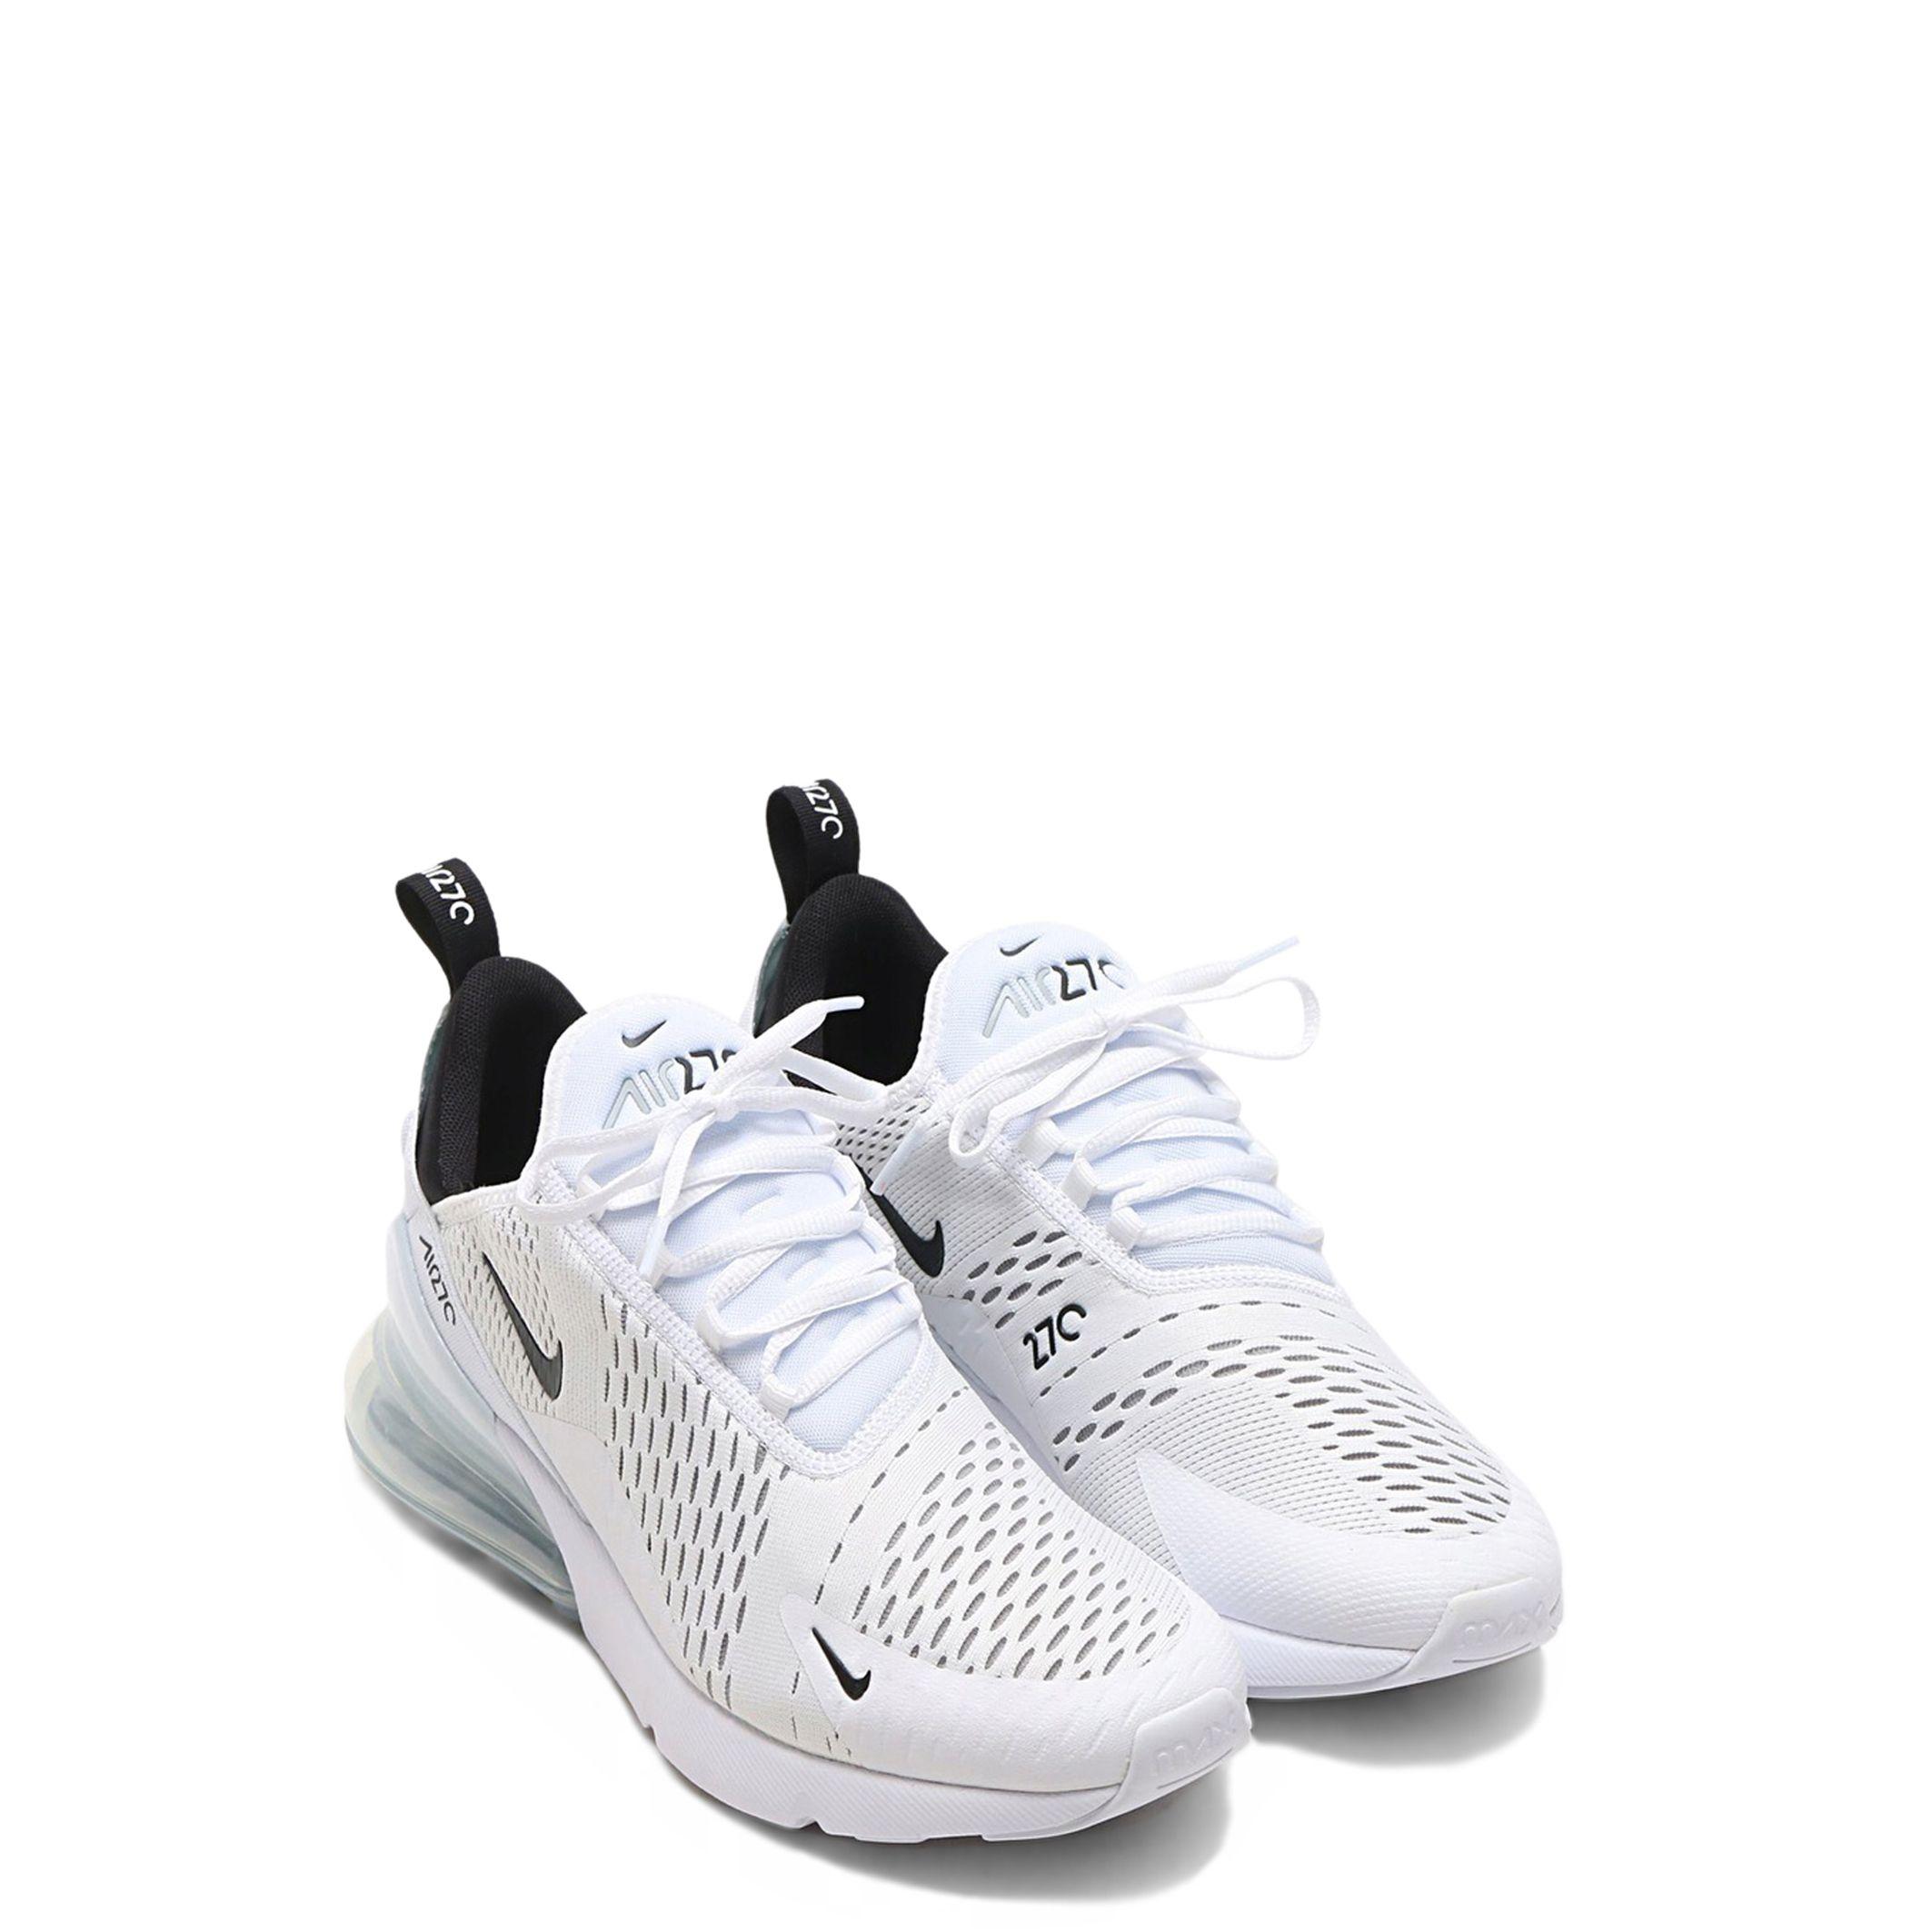 Nike – AirMax270 – Blanco